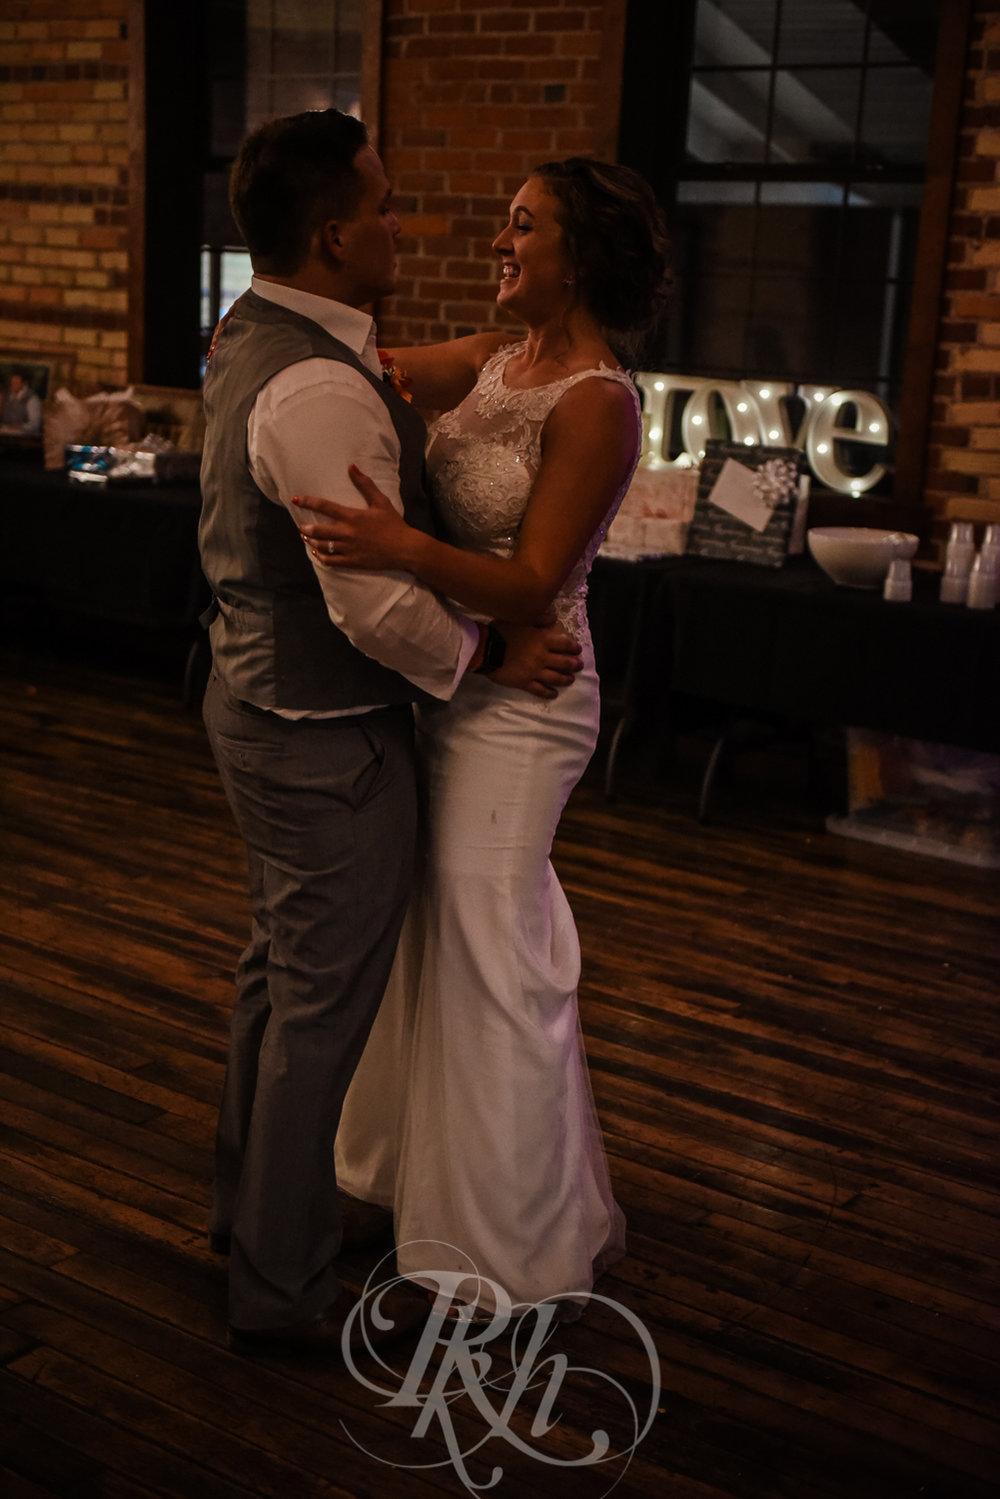 Kelsey & Kevin - Wisconsin Wedding Photography - RKH Images - Blog -17.jpg